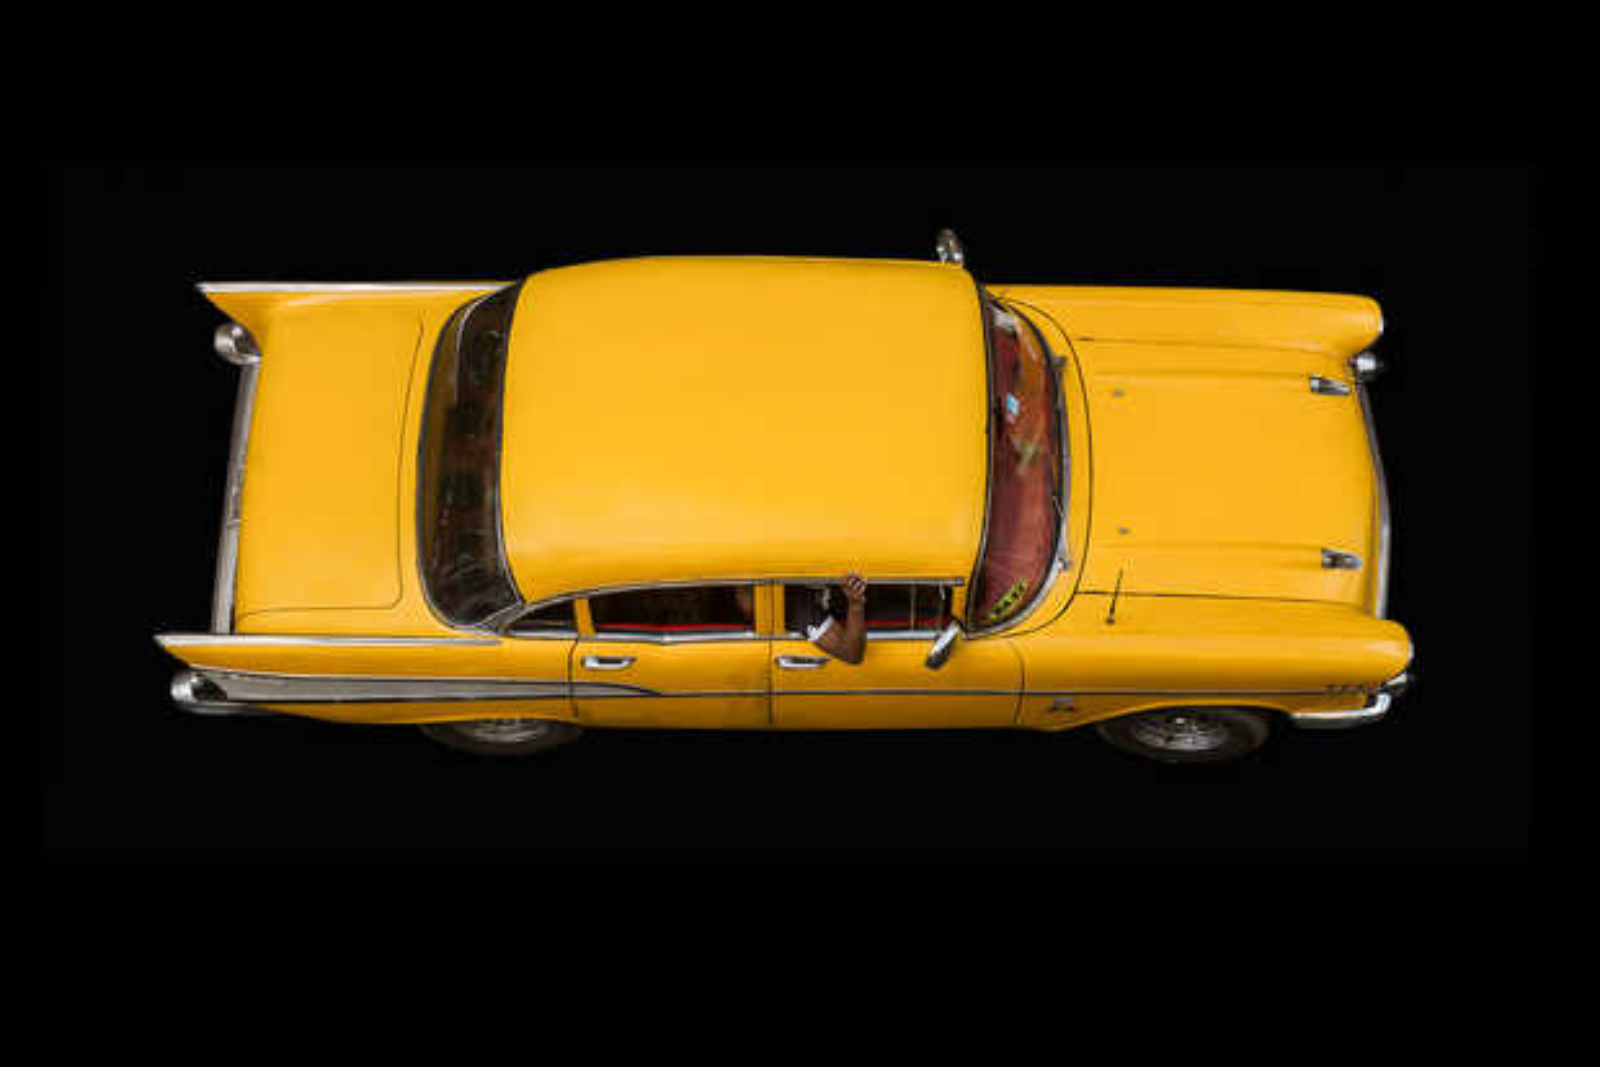 Chevrolet Bel Air, 1957 - Thomas Meinicke